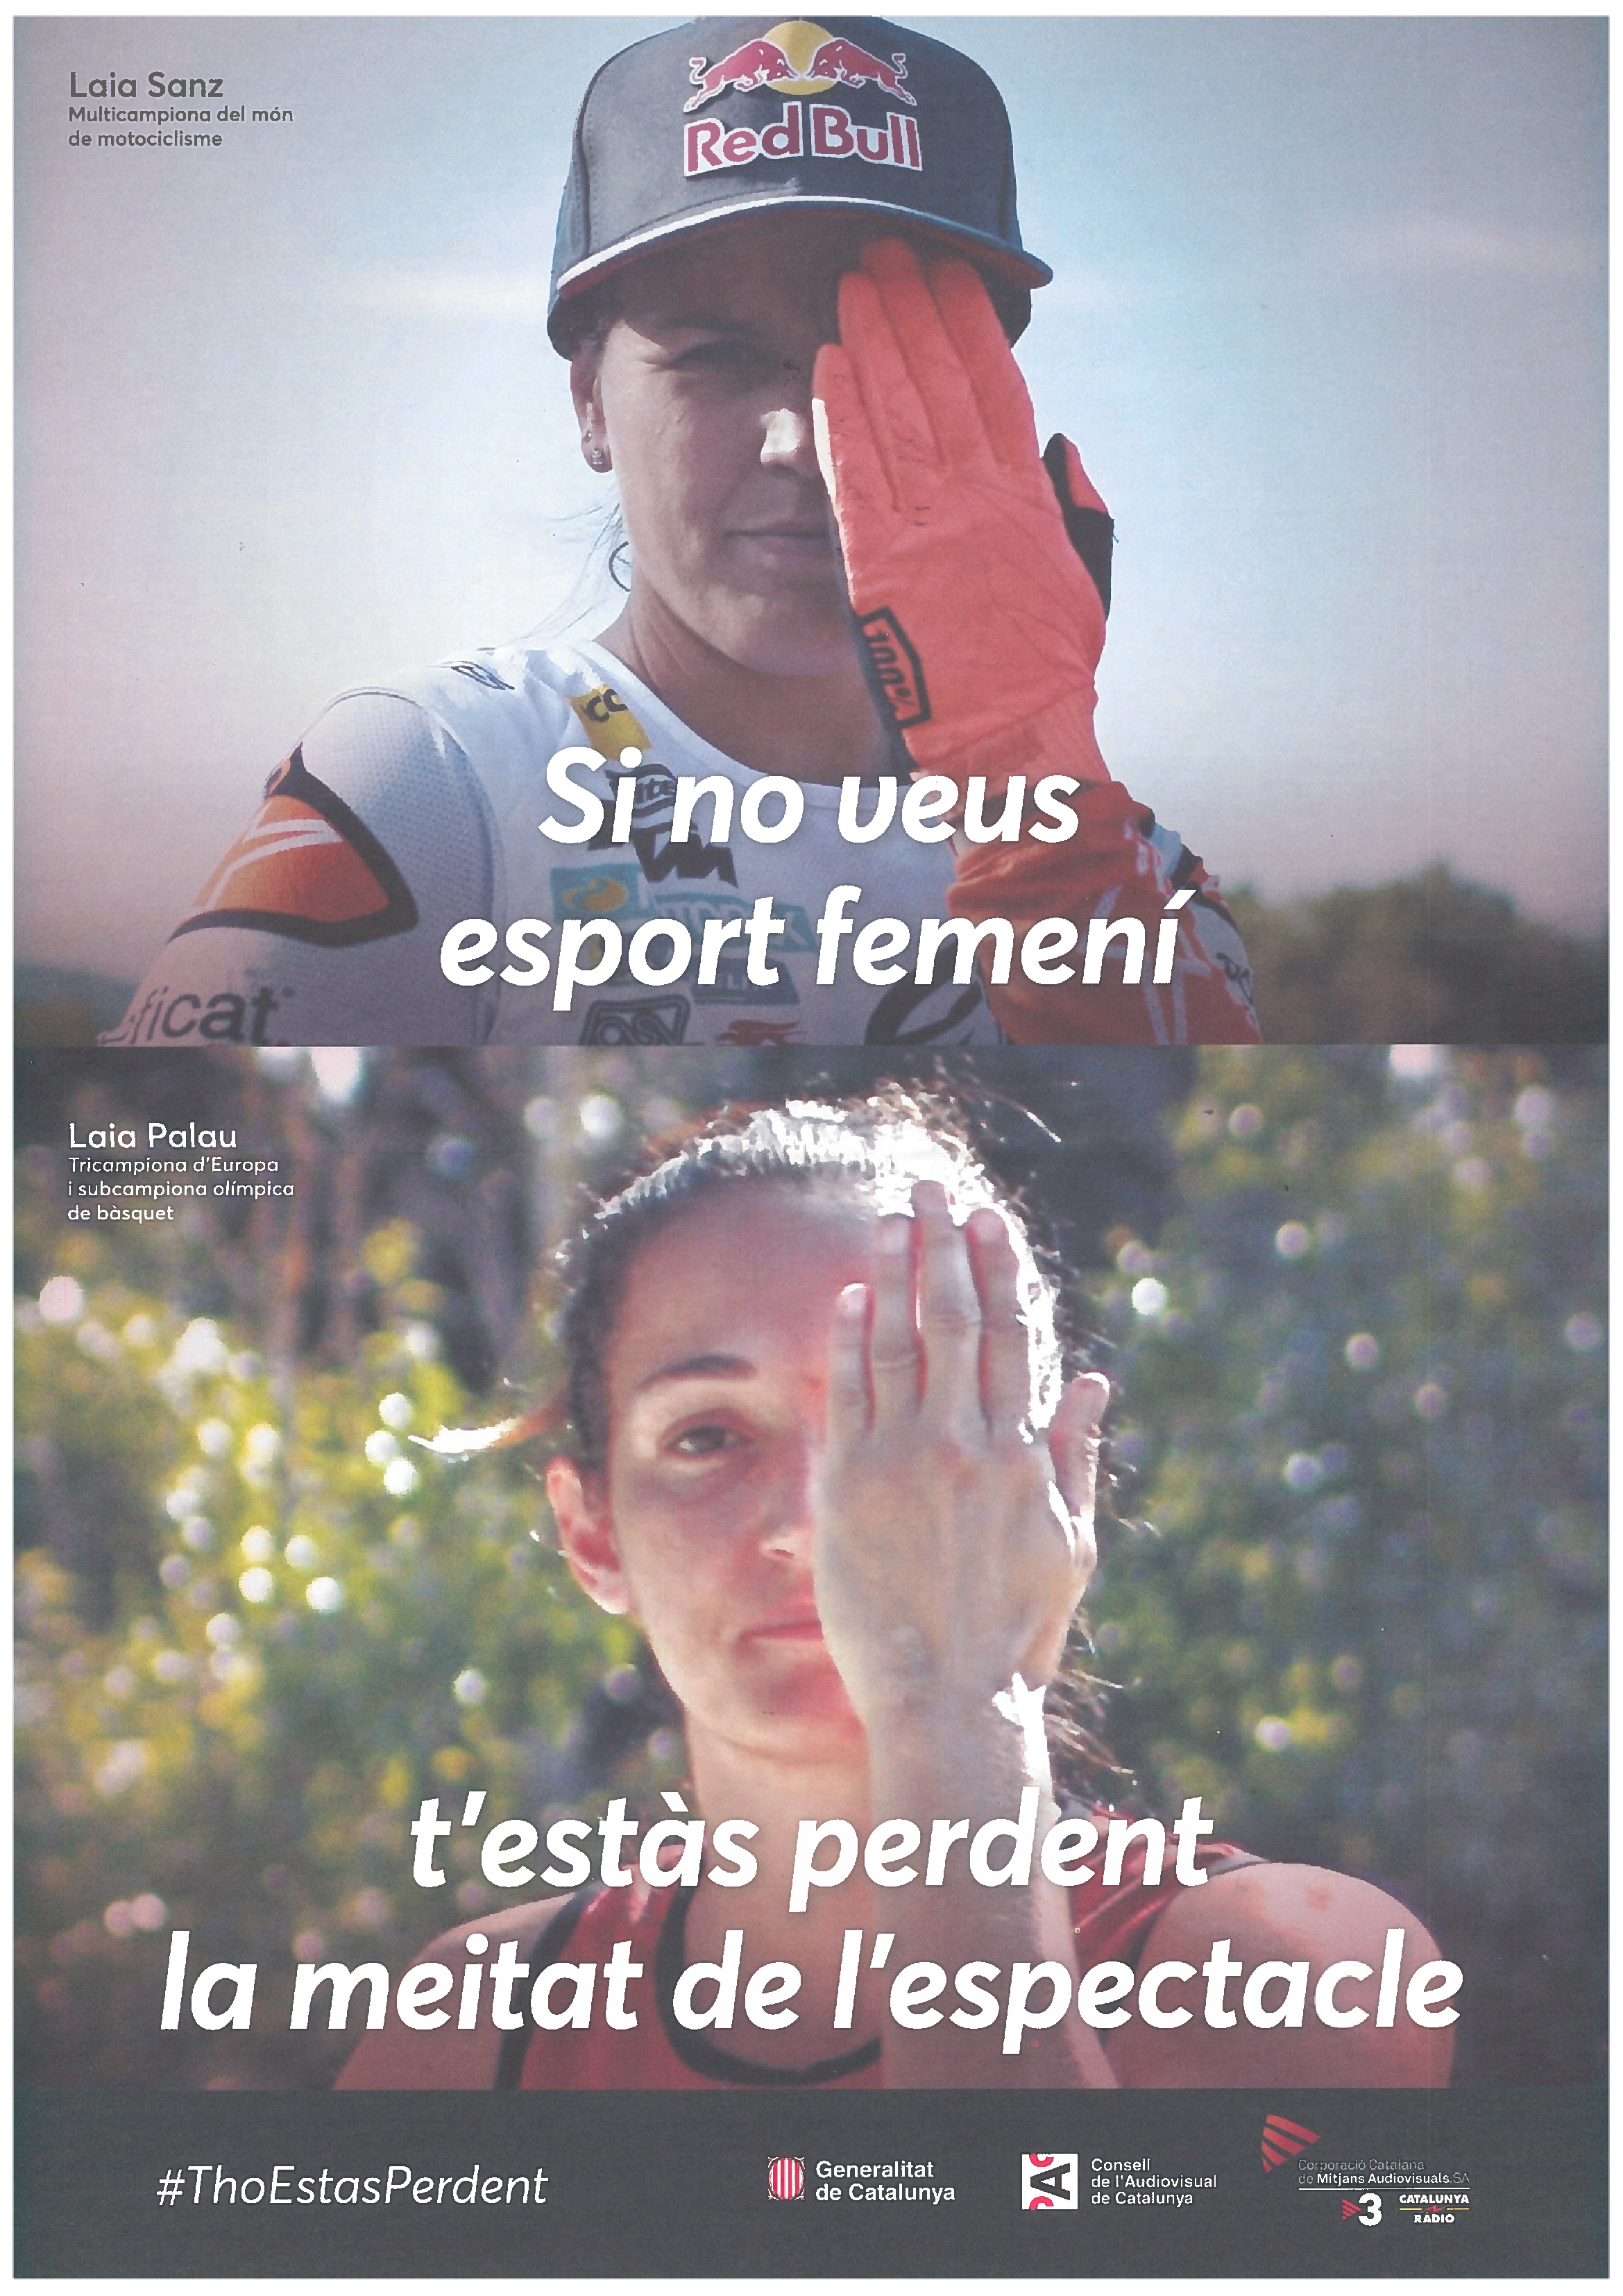 DEPORTE FEMENINO, NO TE LO PIERDAS